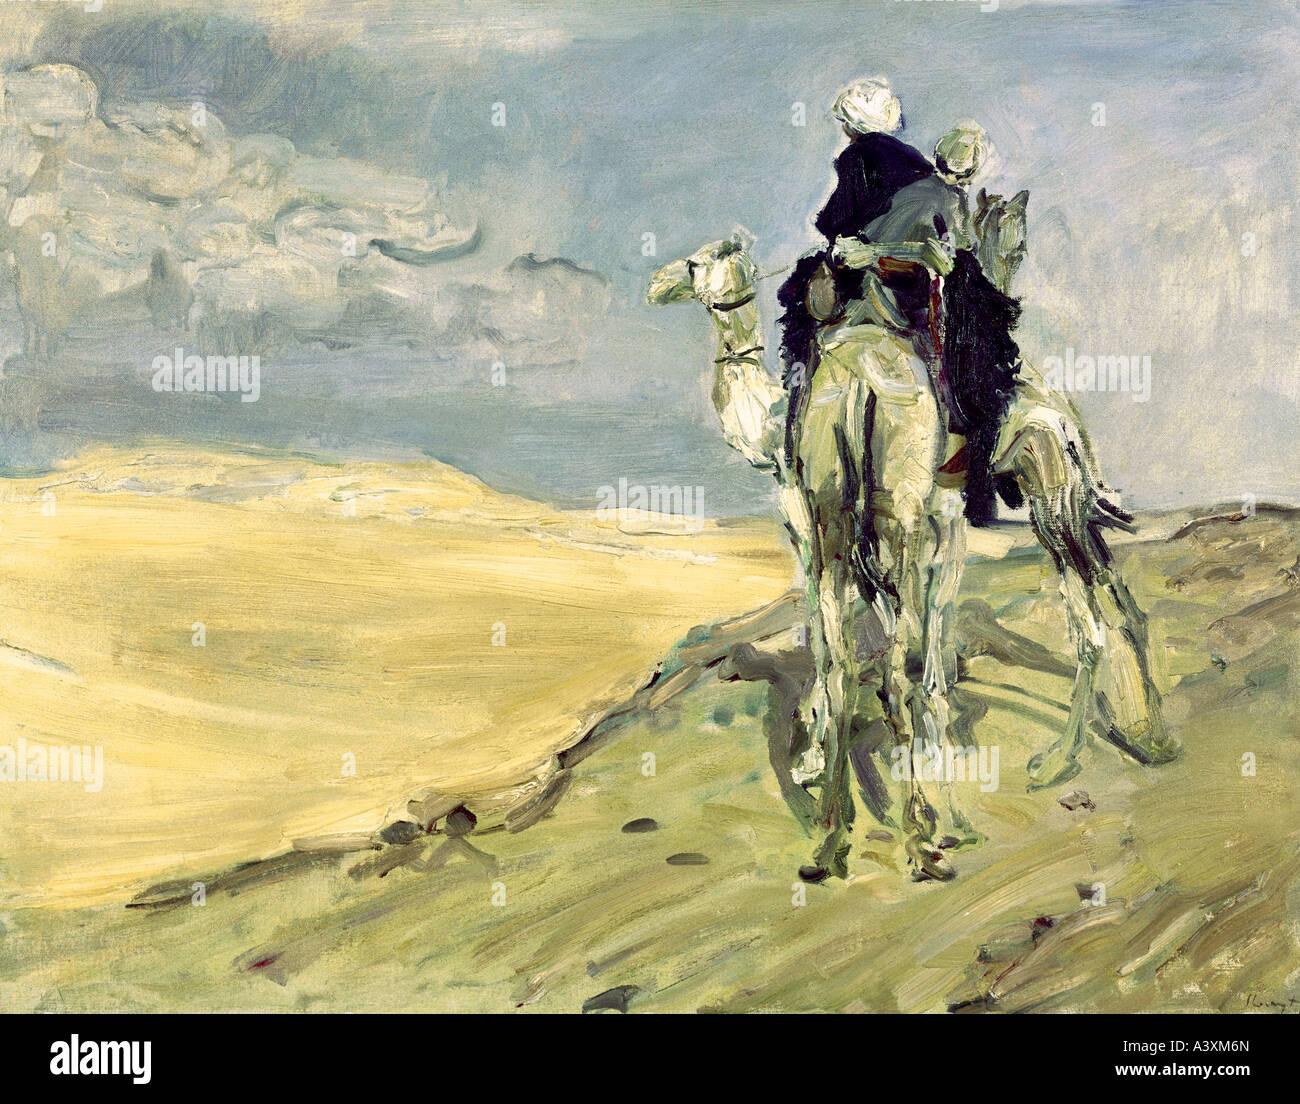 "'Fine Arts, Slevogt, Max (8.10.1868 - 20.9.1932), la peinture ""andsturm in der', ancien Wüste Photo Stock"